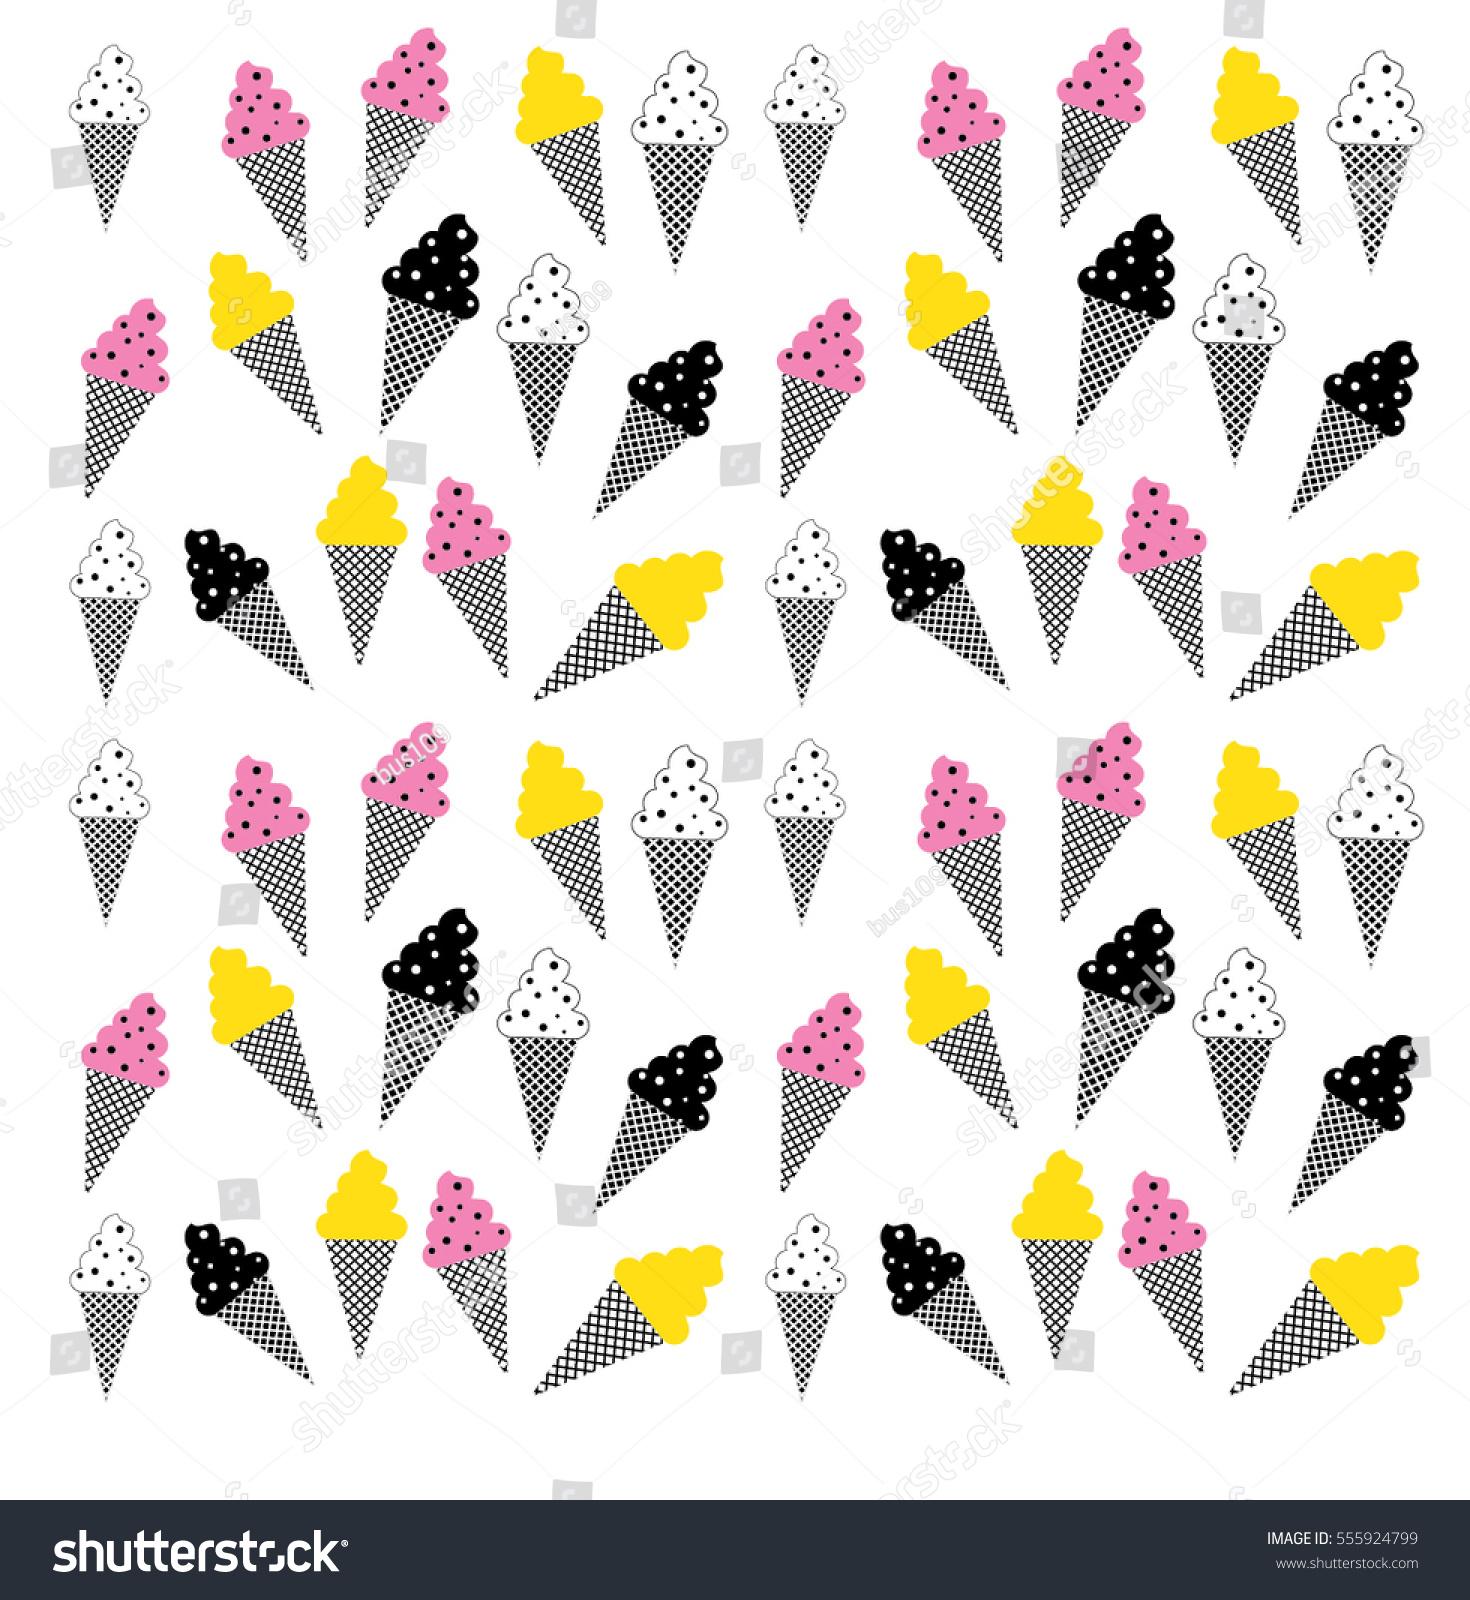 Ice Cream Cones Seamless Pattern Background Stock Vector: Ice Cream Cones Seamless Pattern Vector Stock Vector